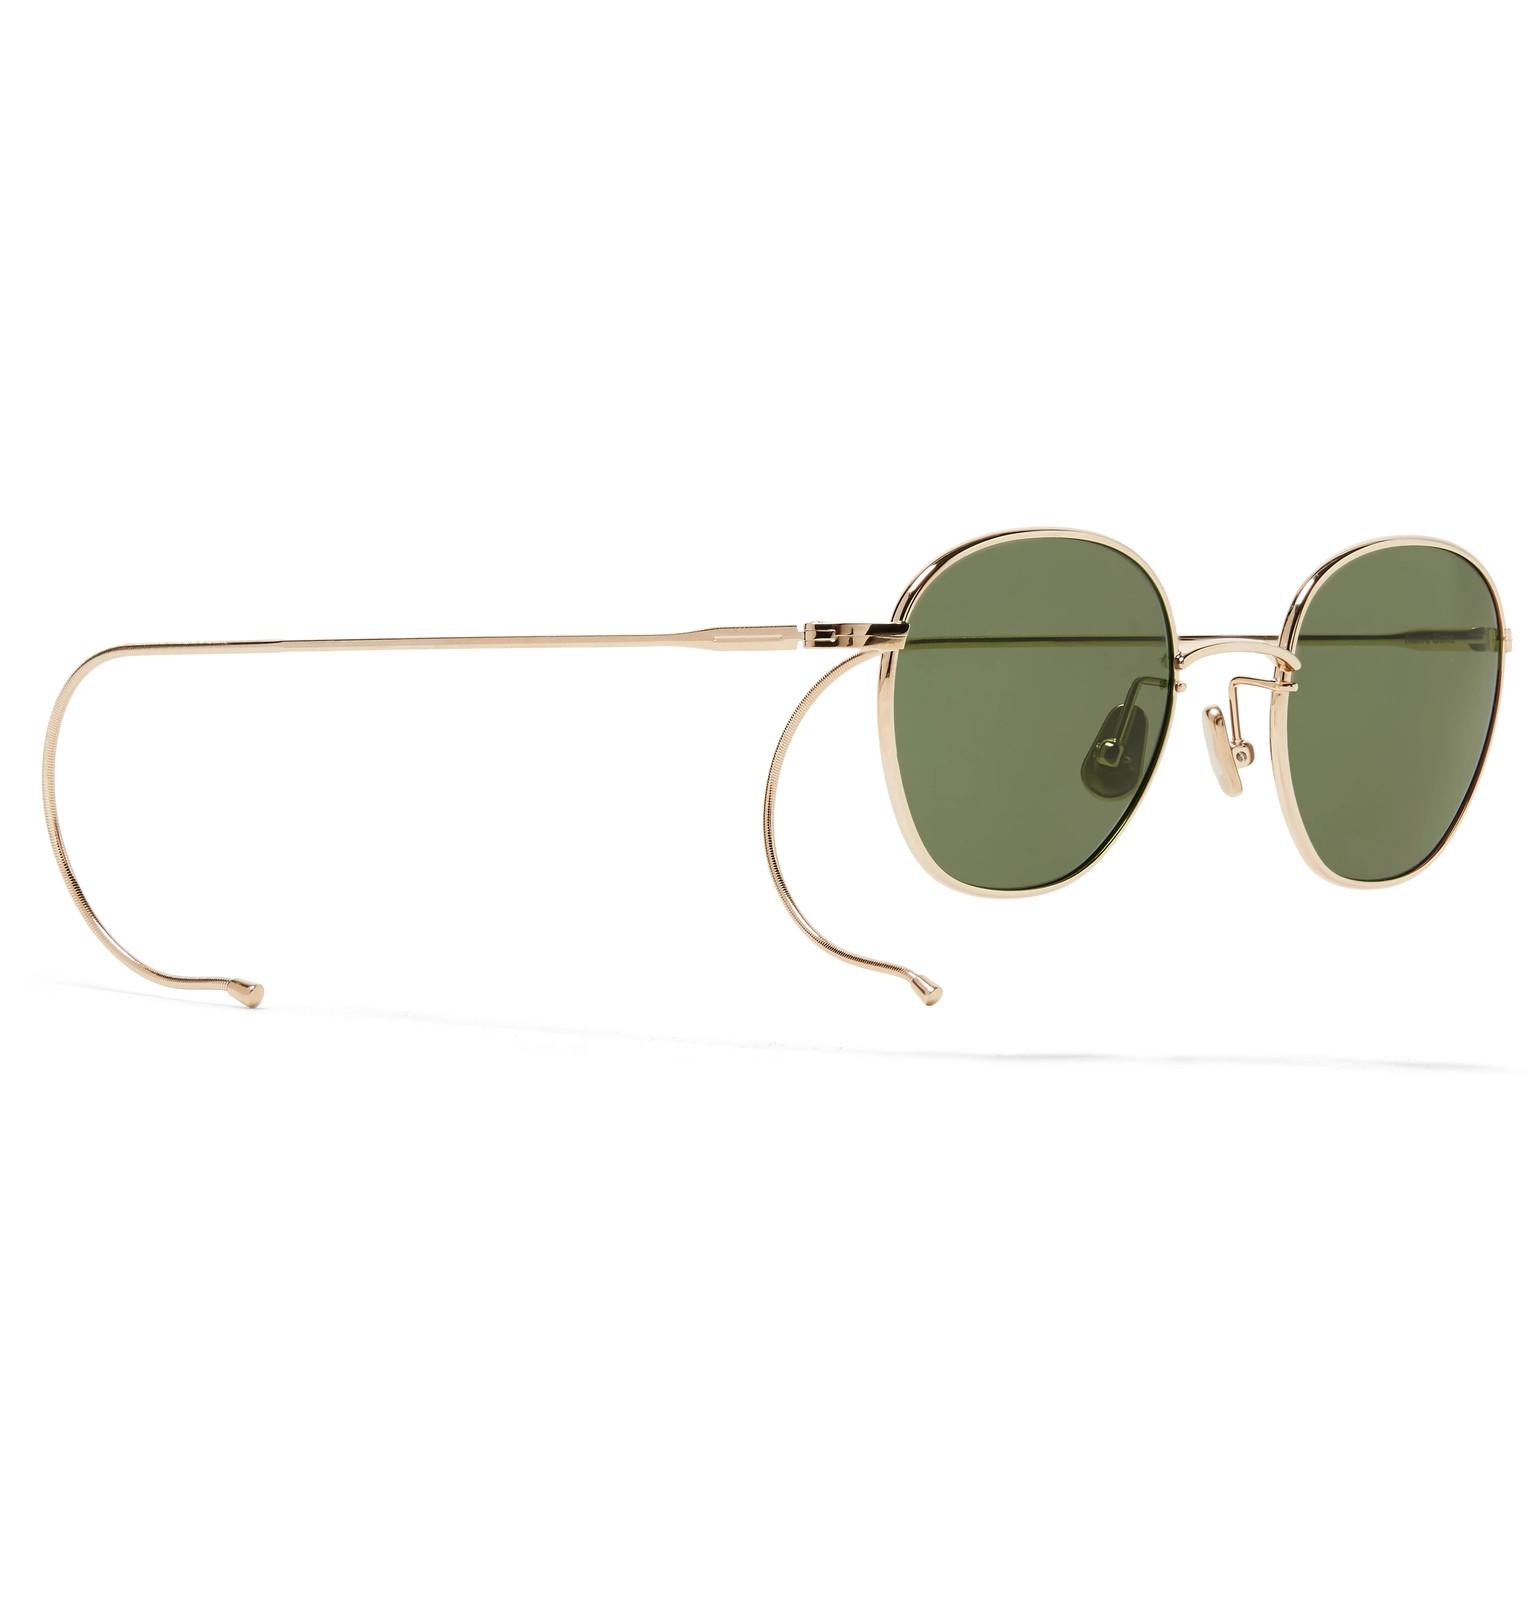 Frame Sunglasses Native Round Sons Gold Roy gRRqt1U